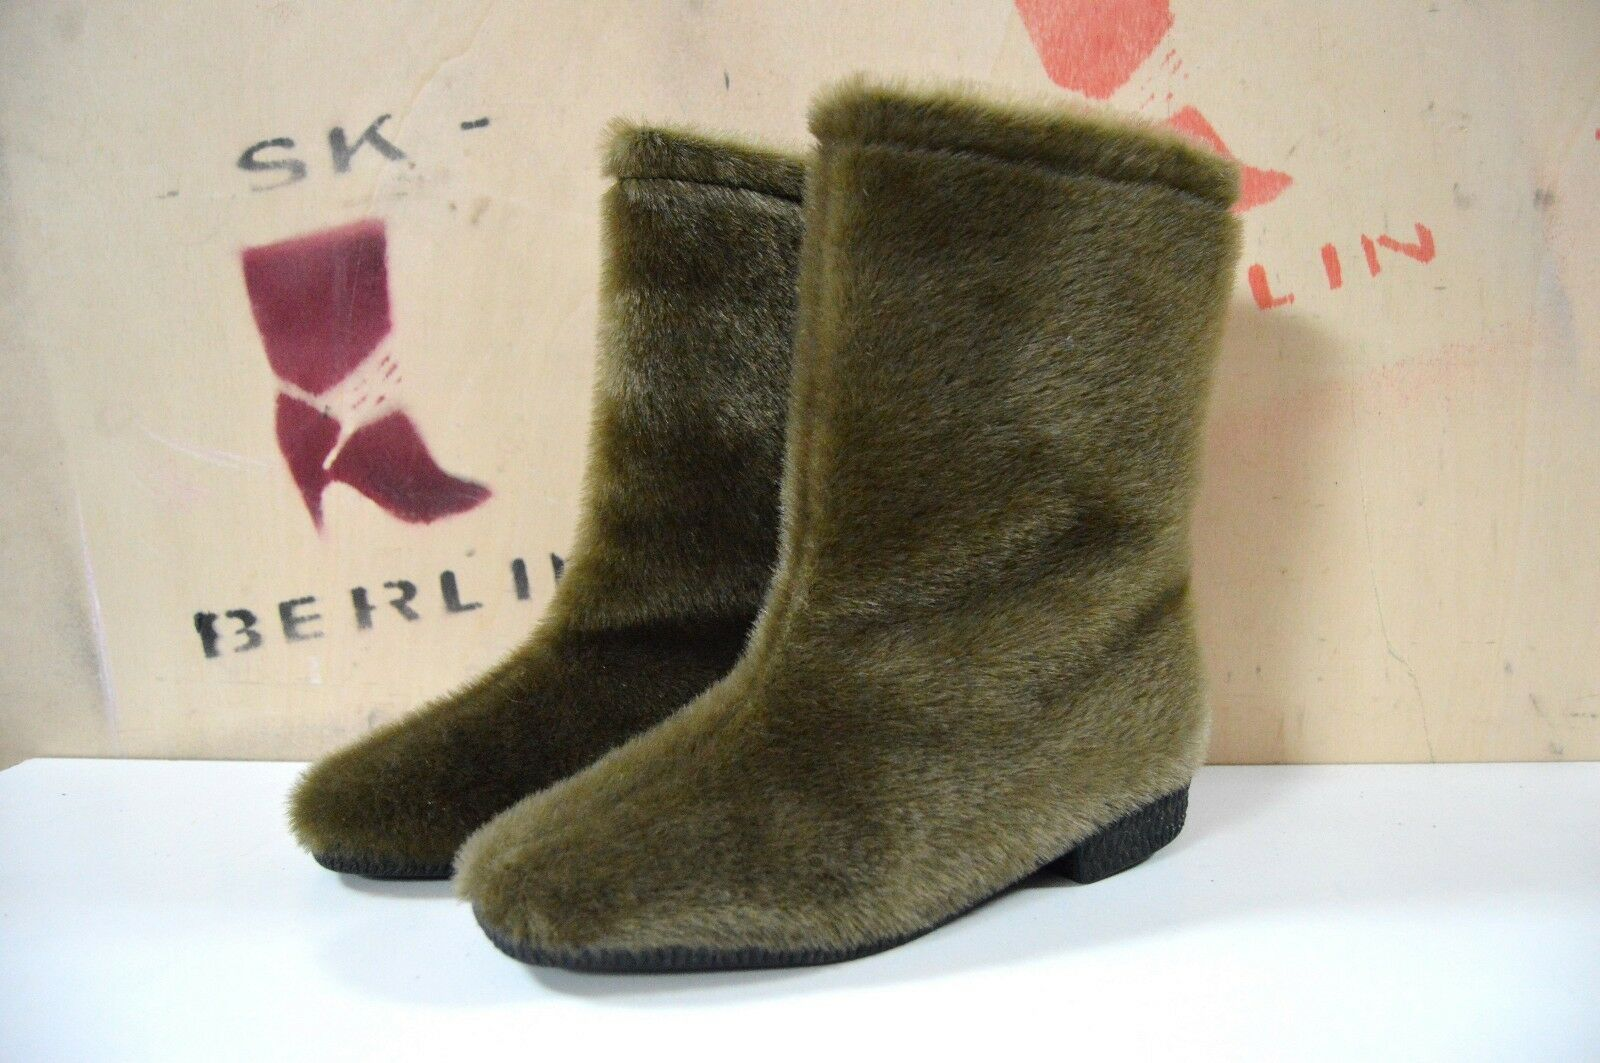 Fell Stiefel Boots Winterstiefel 70er TRUE VINTAGE 80er bottes stivali invernali